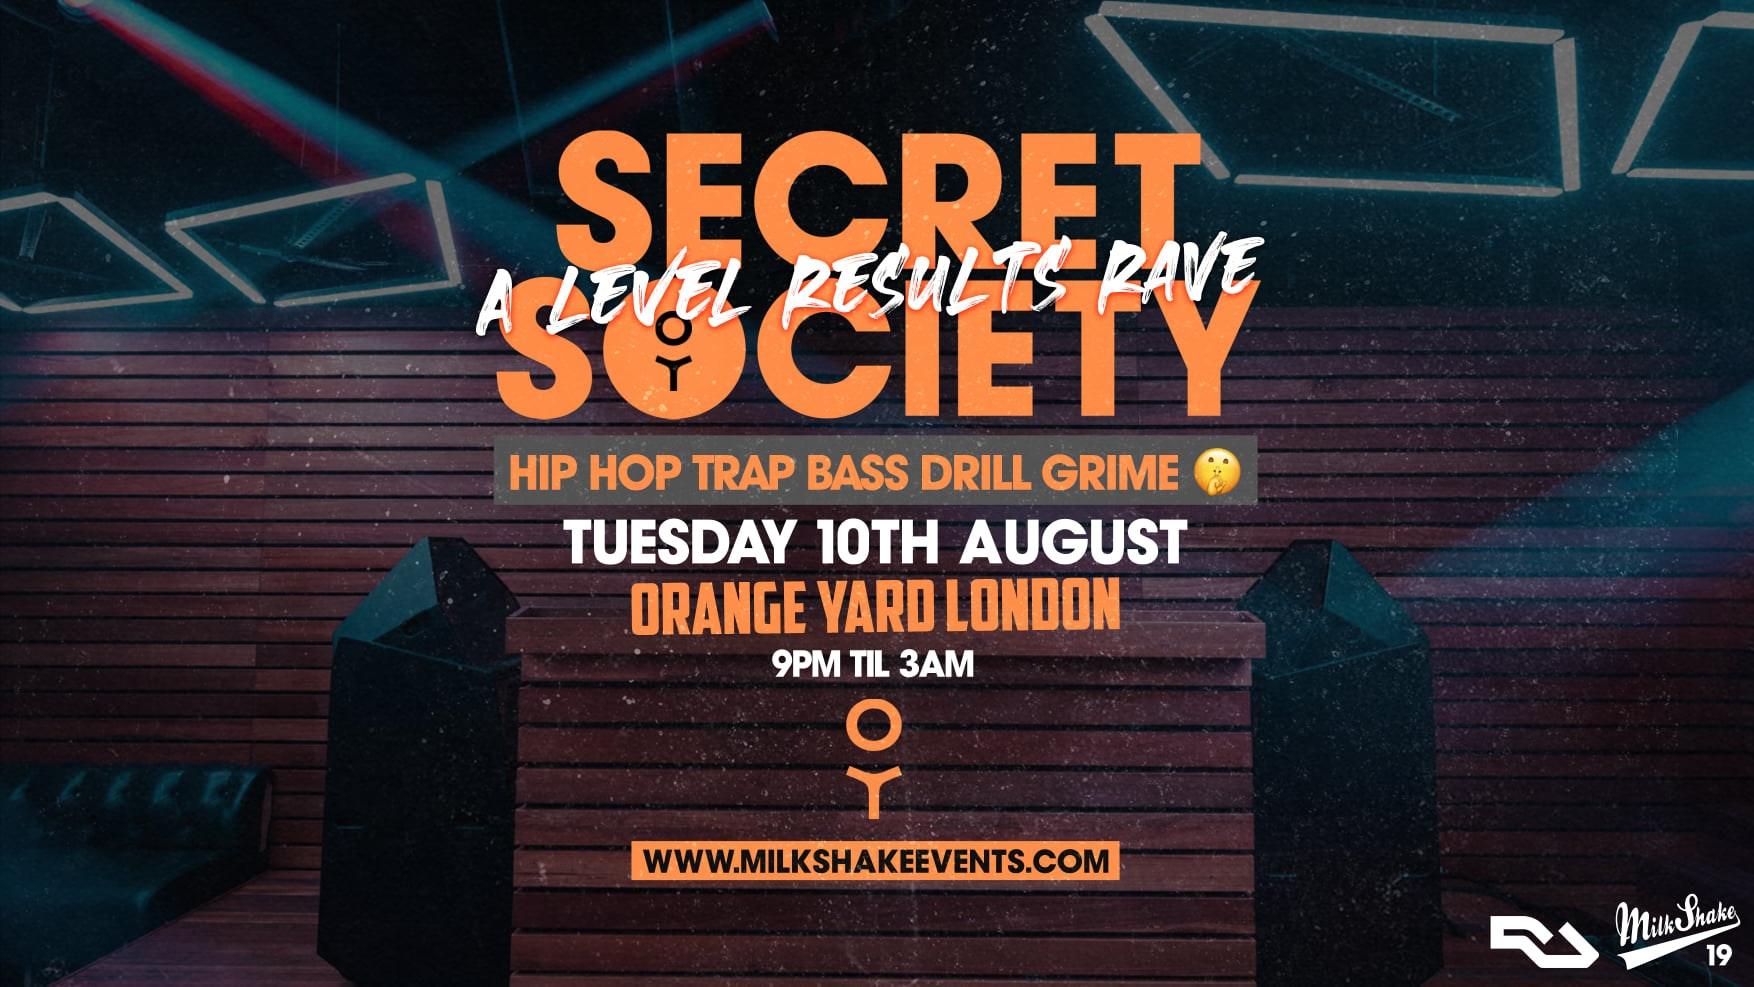 Secret Society – A Level Results Day Rave at Orange Yard London 🔥